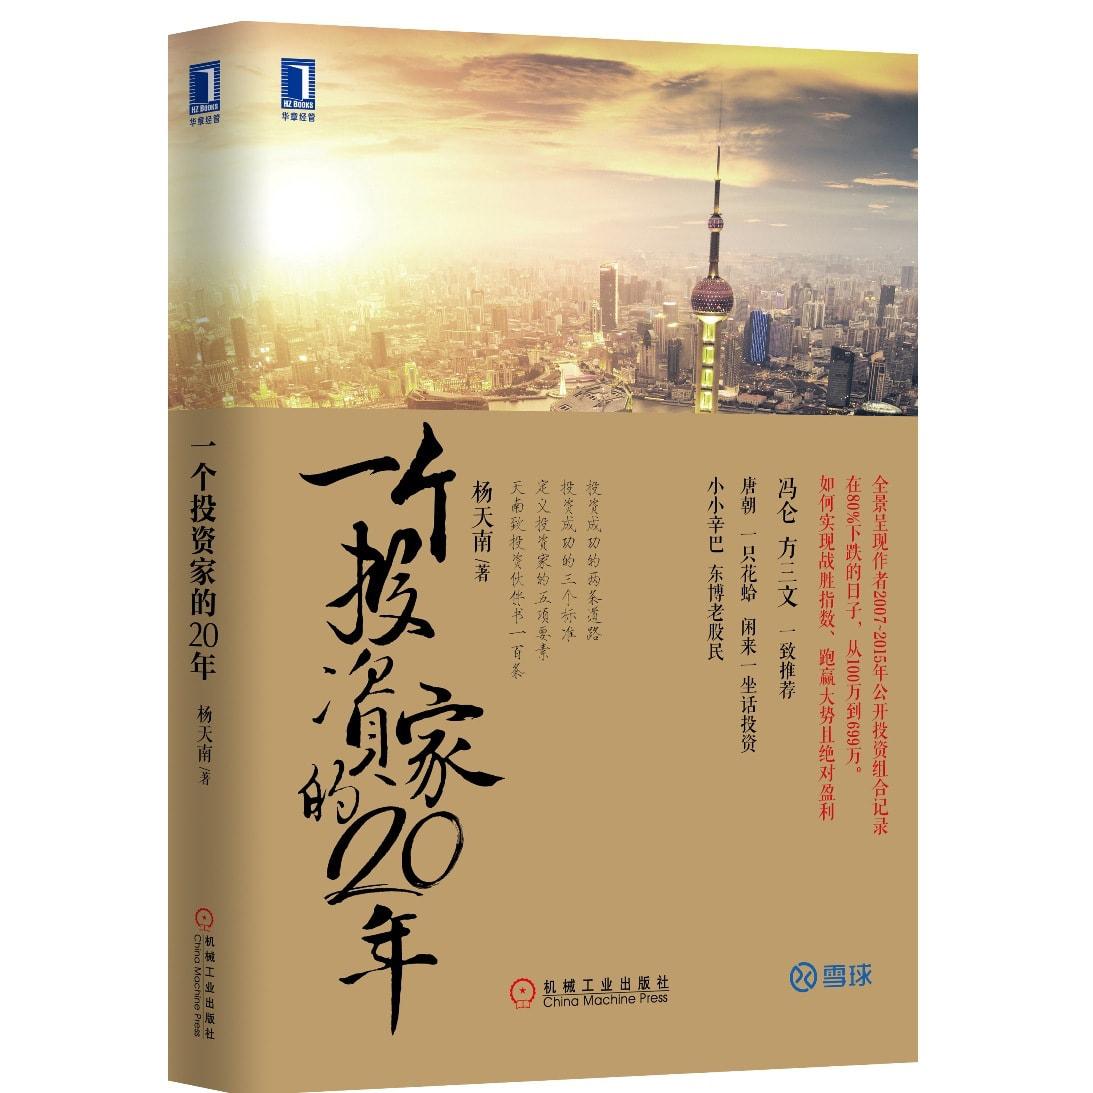 Yamibuy.com:Customer reviews:一个投资家的20年